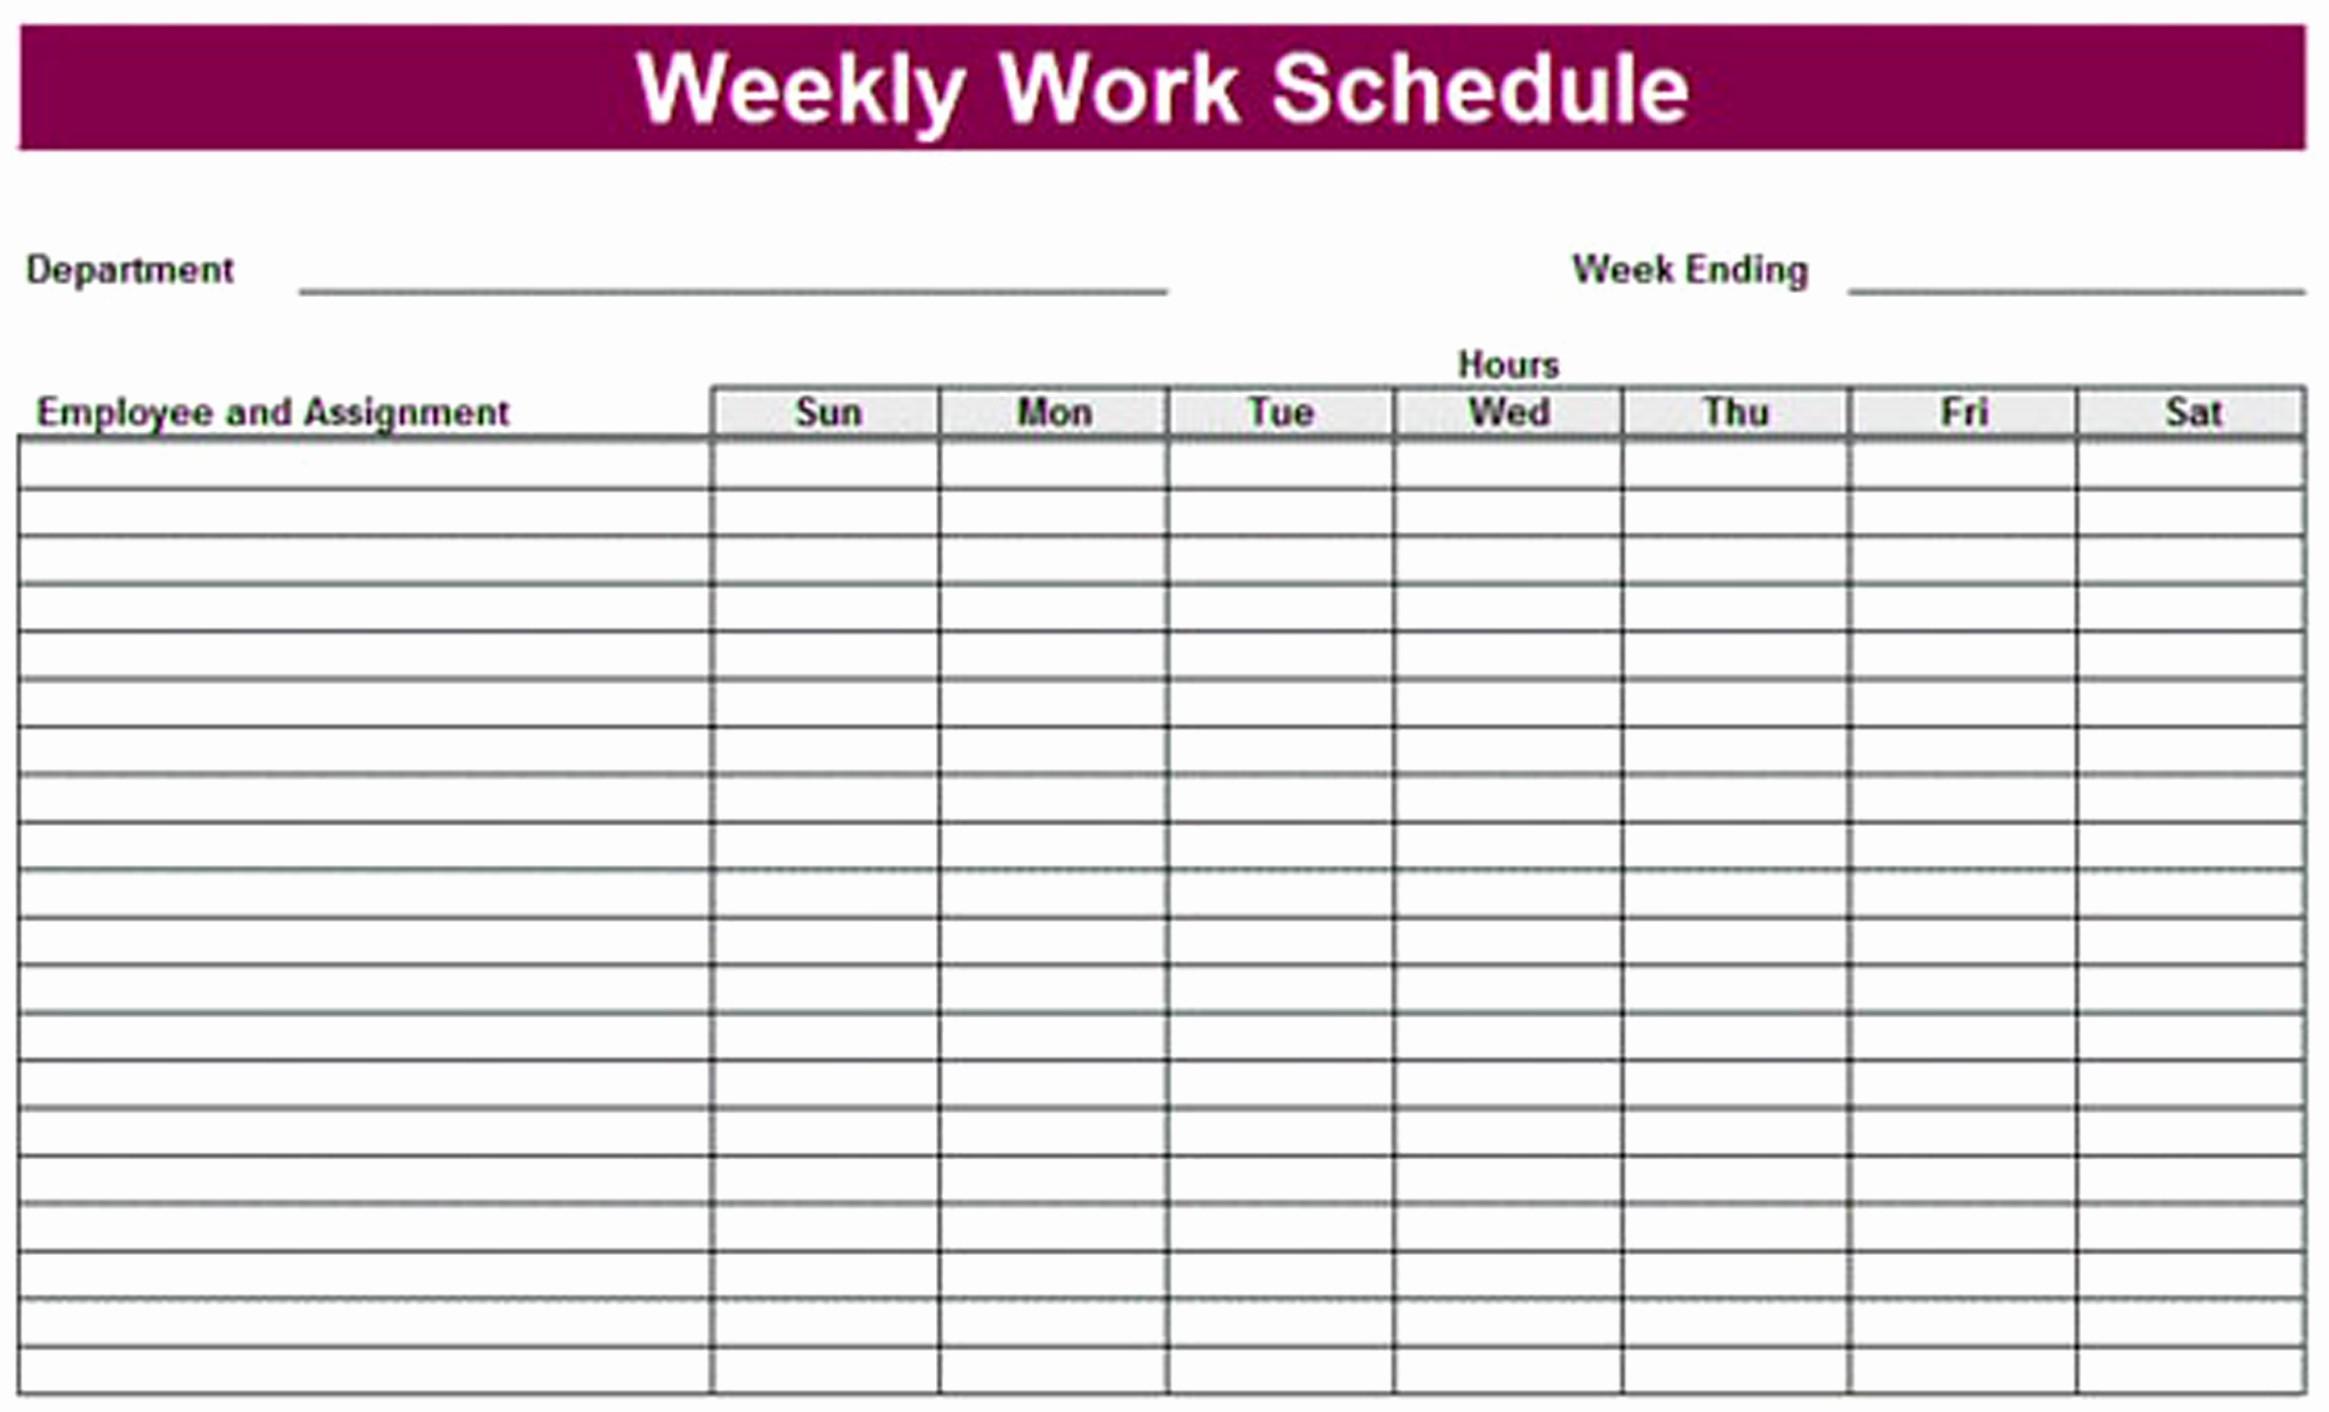 Microsoft Excel Weekly Schedule Template Inspirational Printable Weekly Schedule Template & Excel Planner